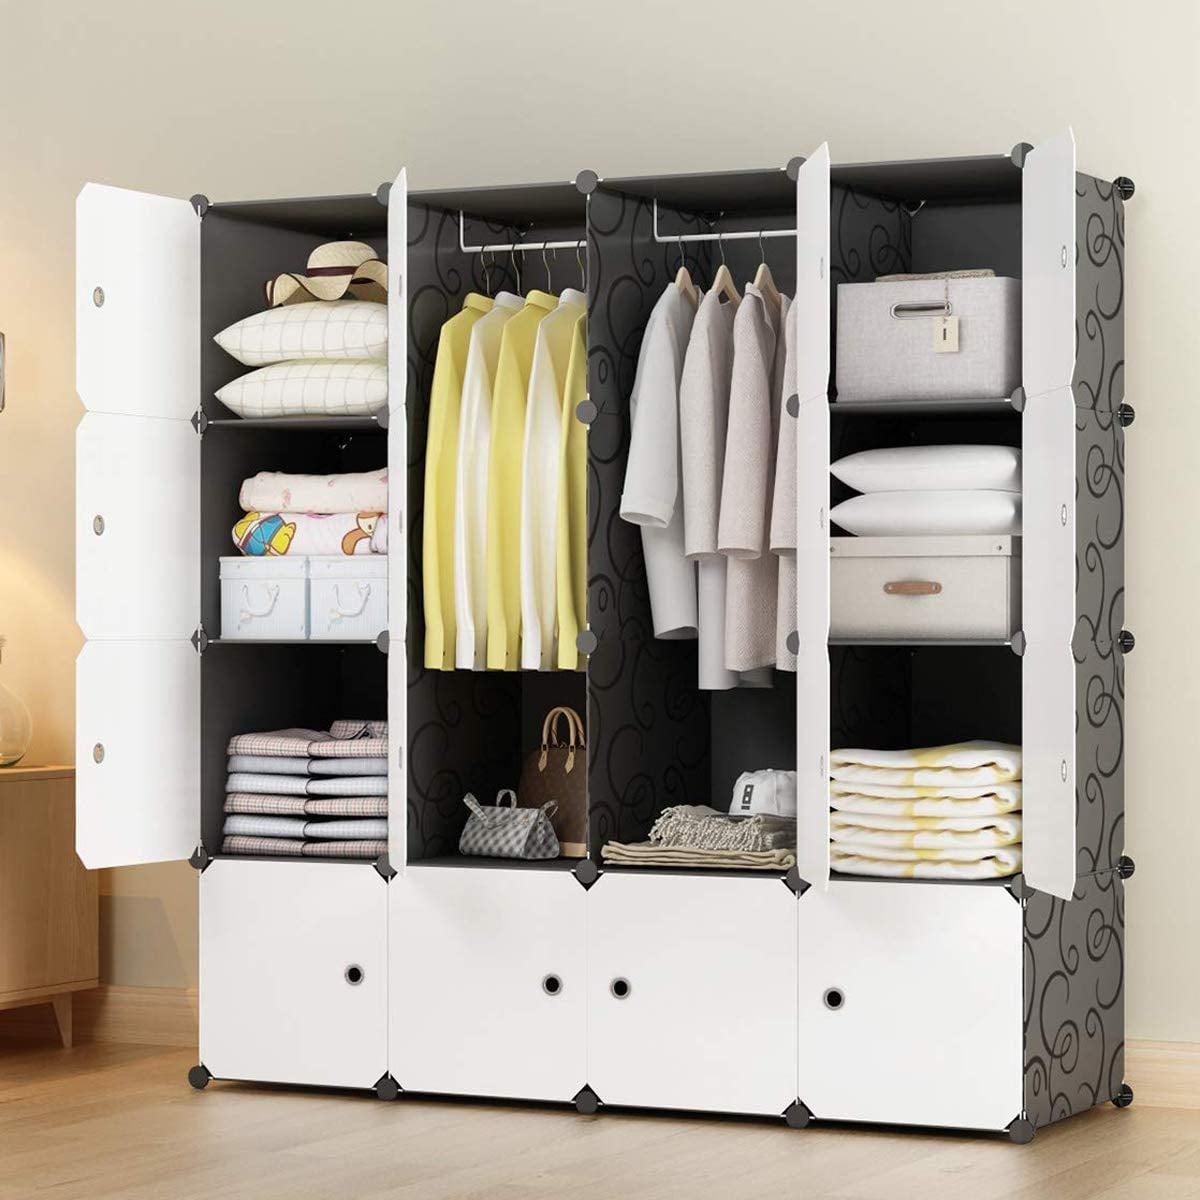 Kousi Portable Closet Organizer Small Bedroom These 50